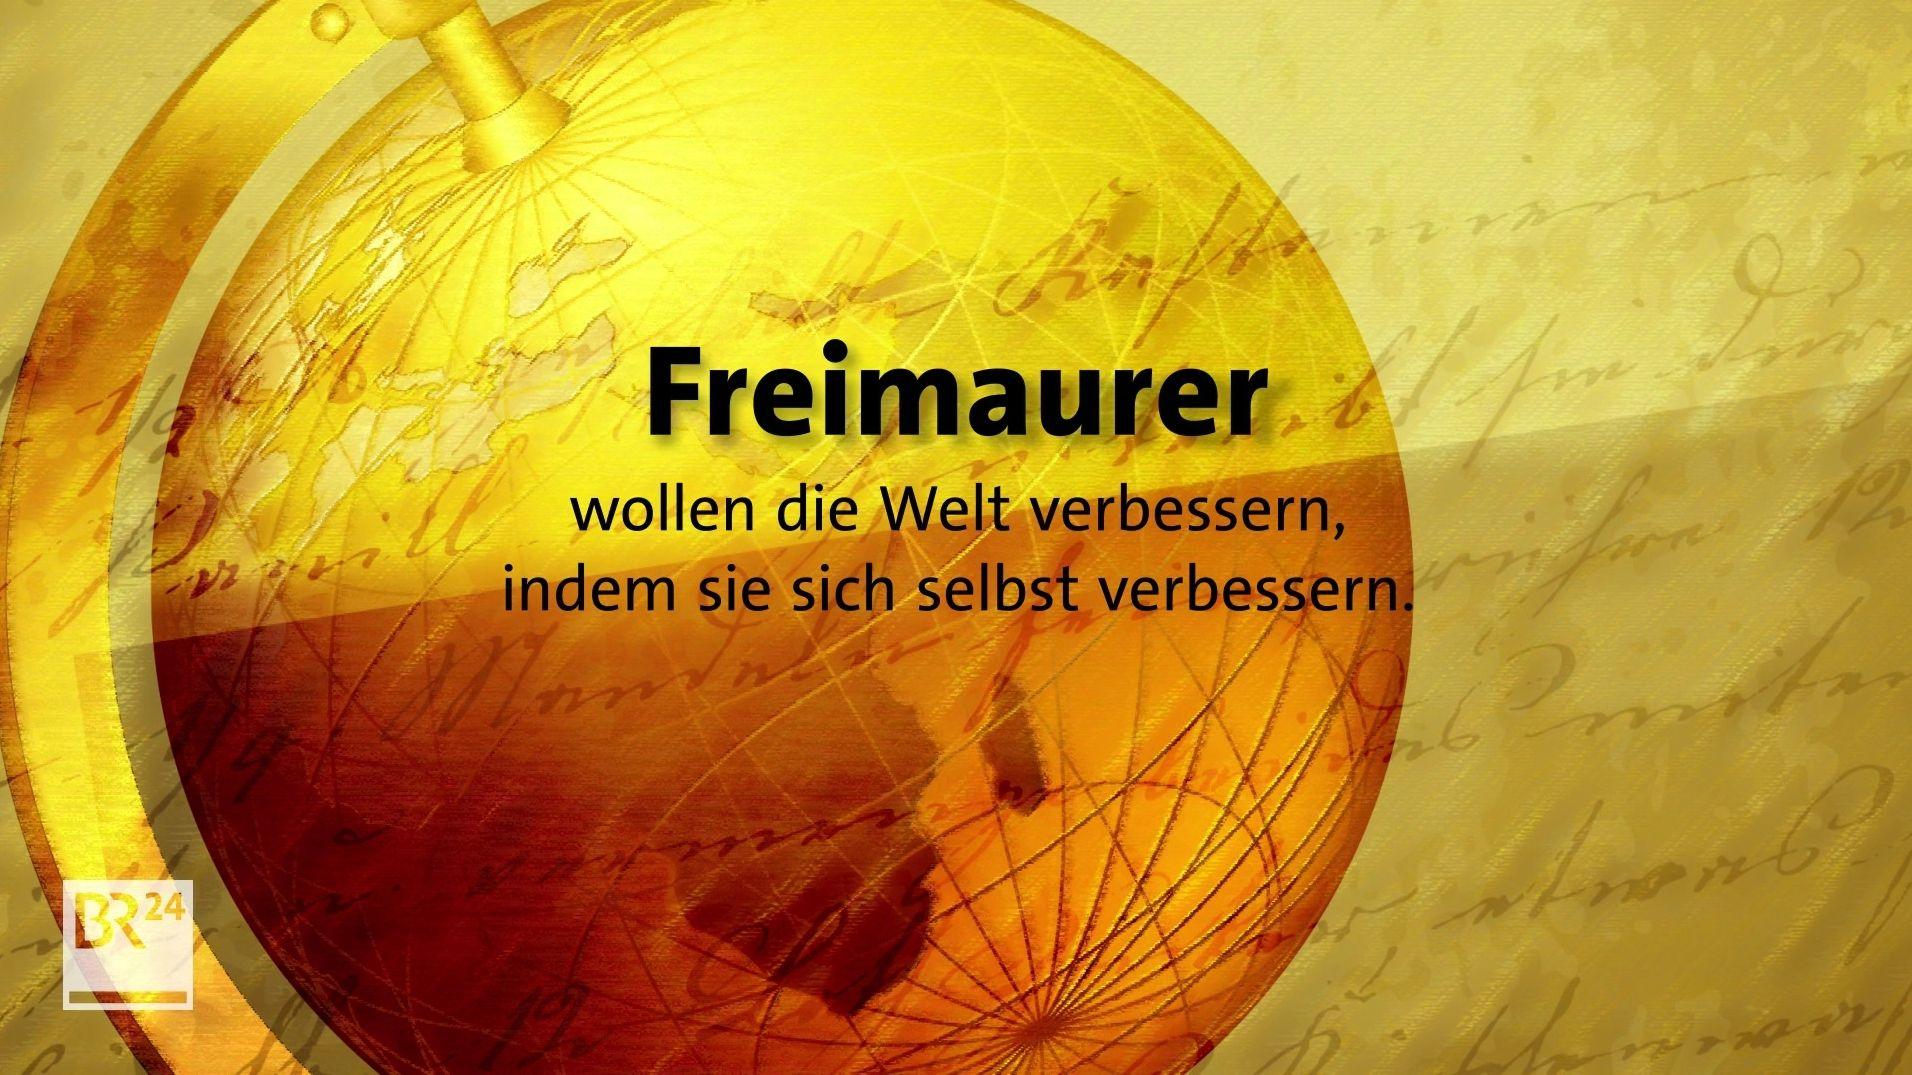 Geheimbündler, Verschwörer, Weltverbesserer: Was sind Freimaurer?